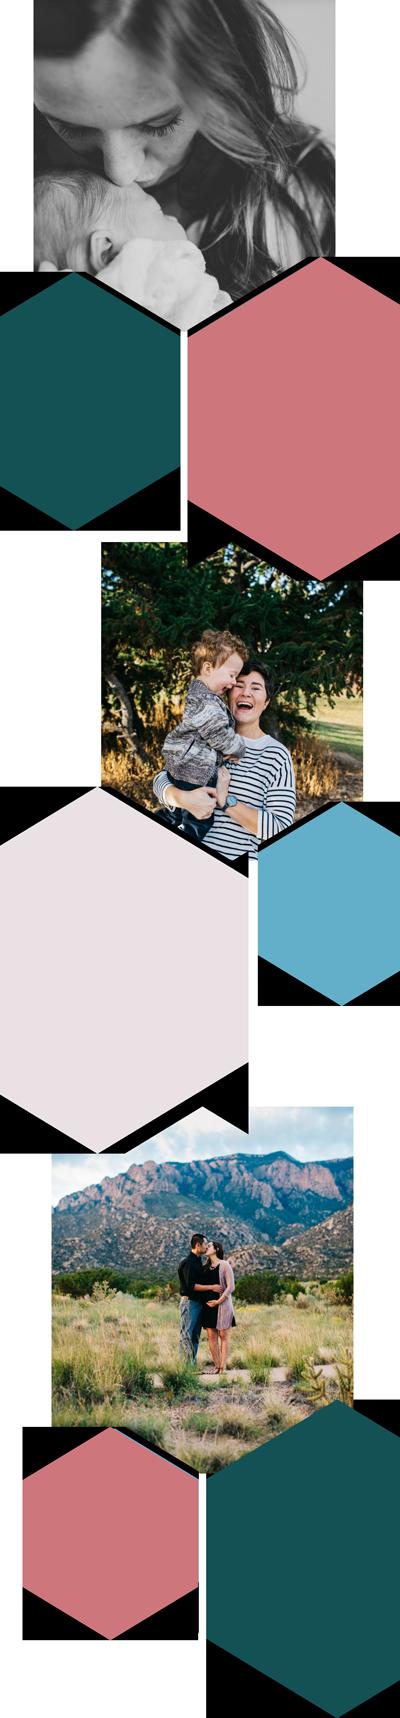 denver-colorado-family-photograph-carrie--experitse.png